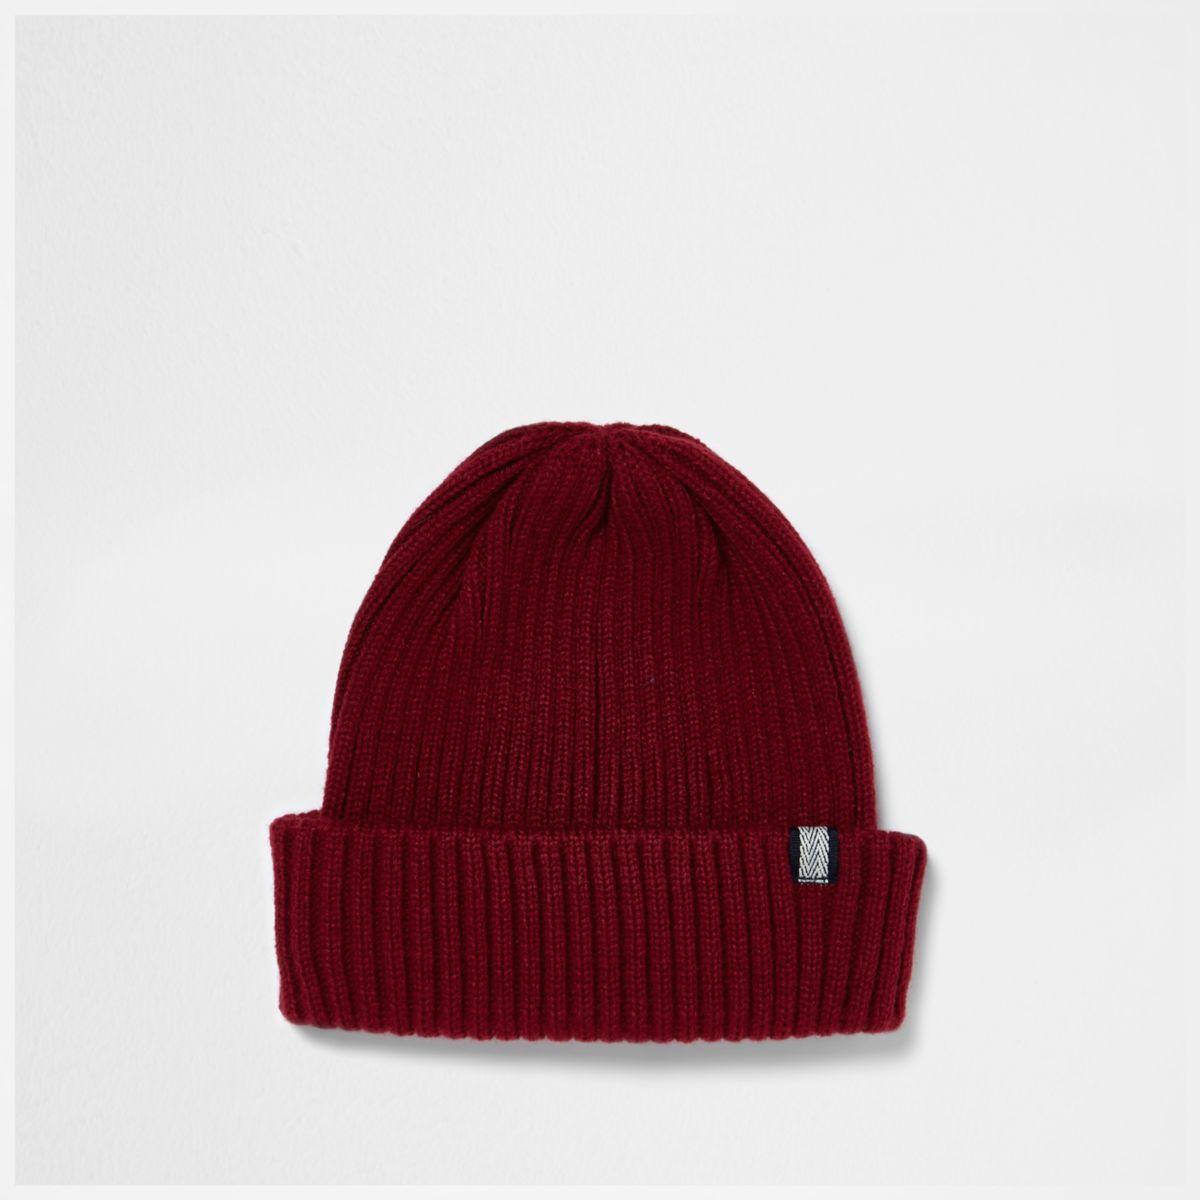 Red fisherman beanie hat